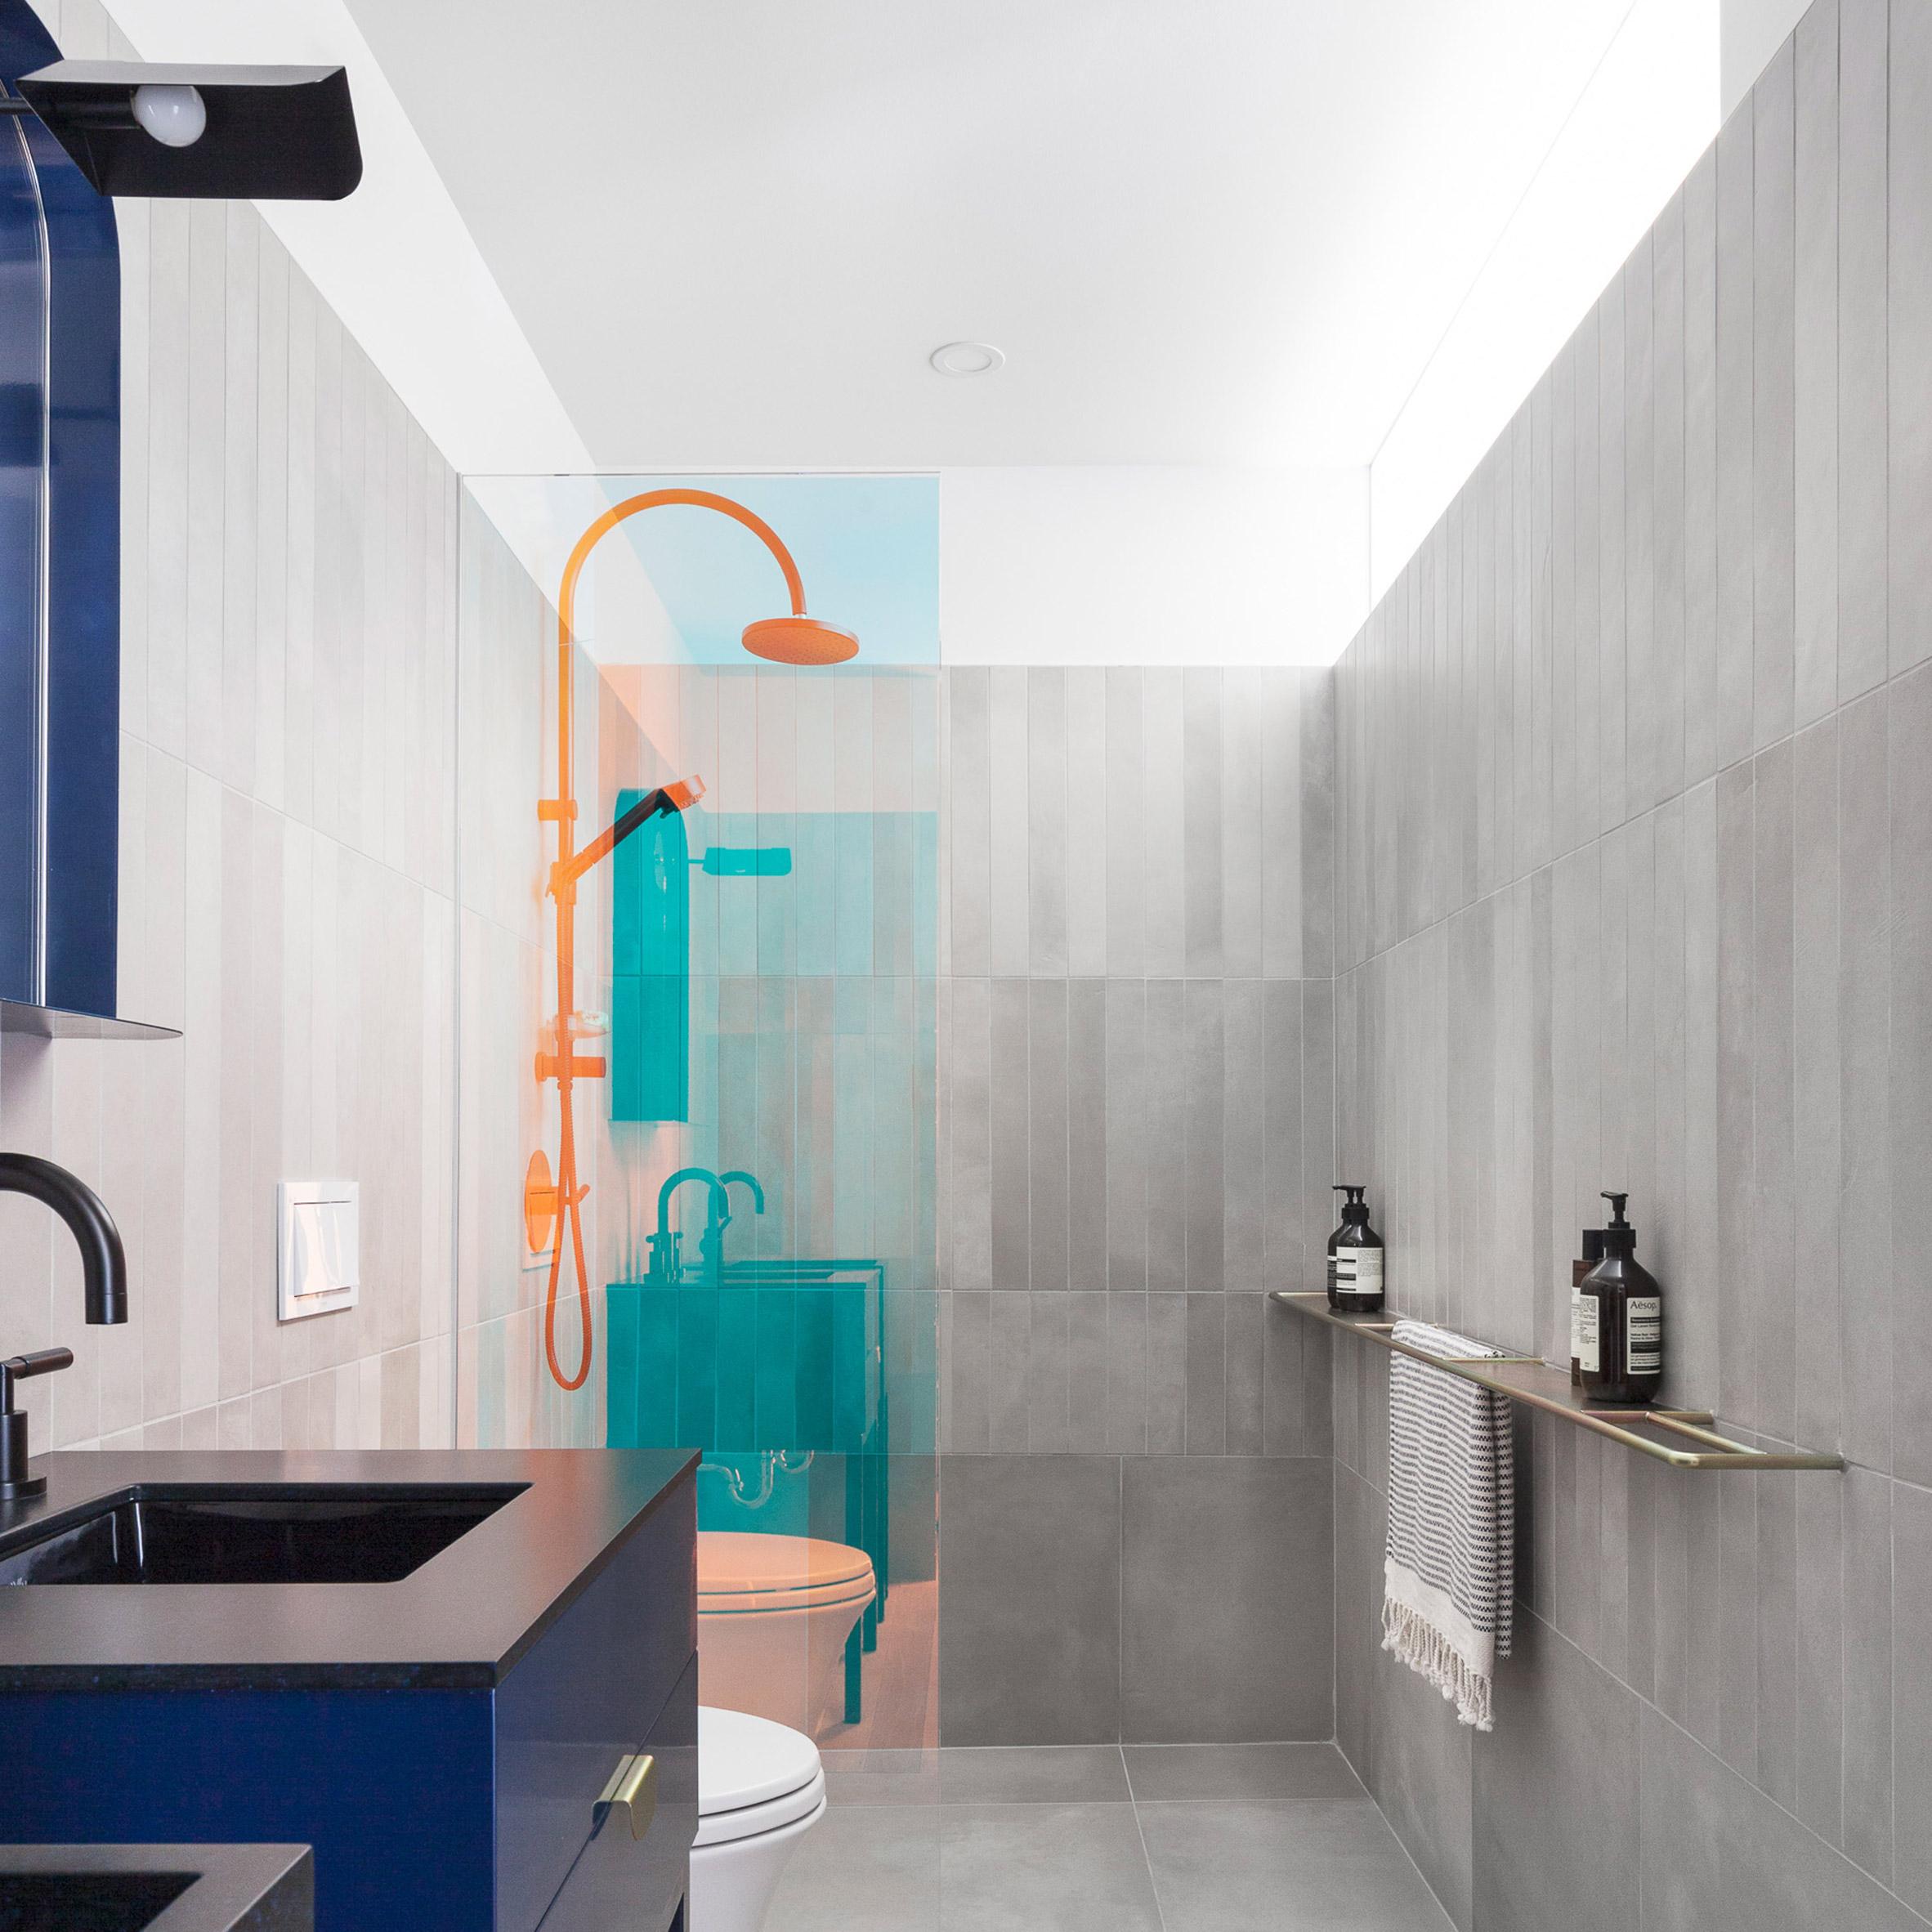 coloured statement shower screen